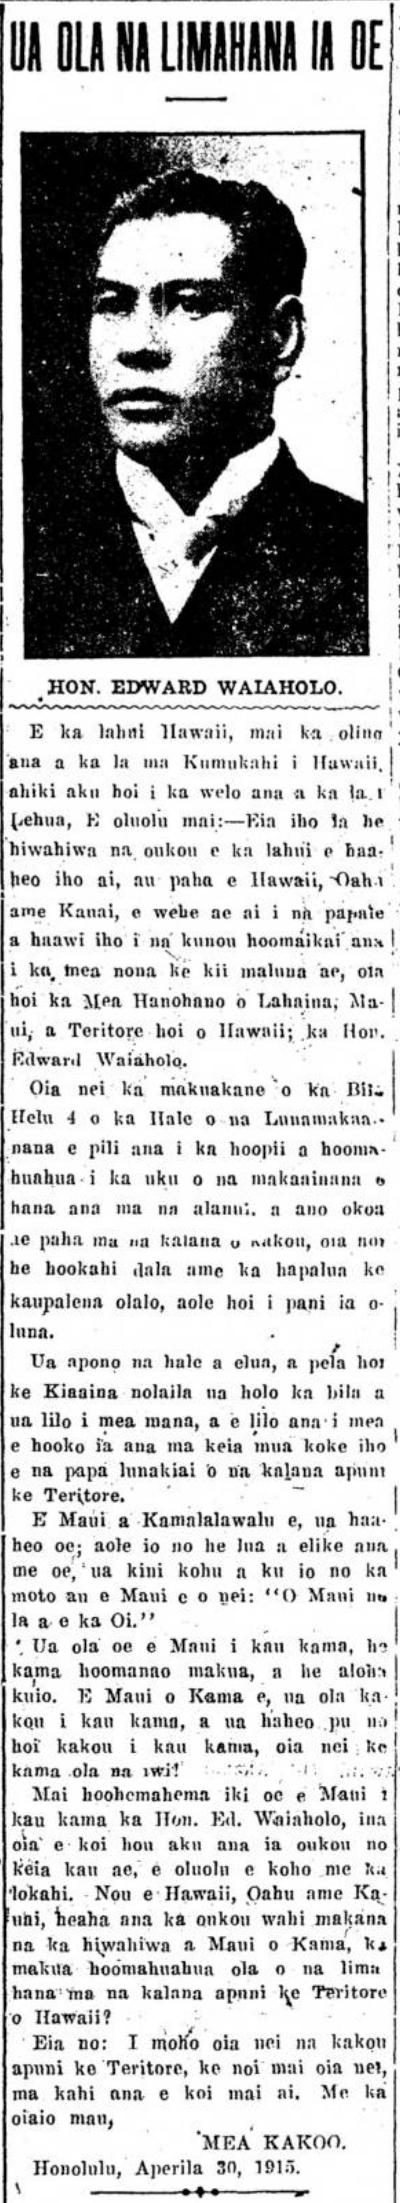 Kuokoa_4_30_1915_4